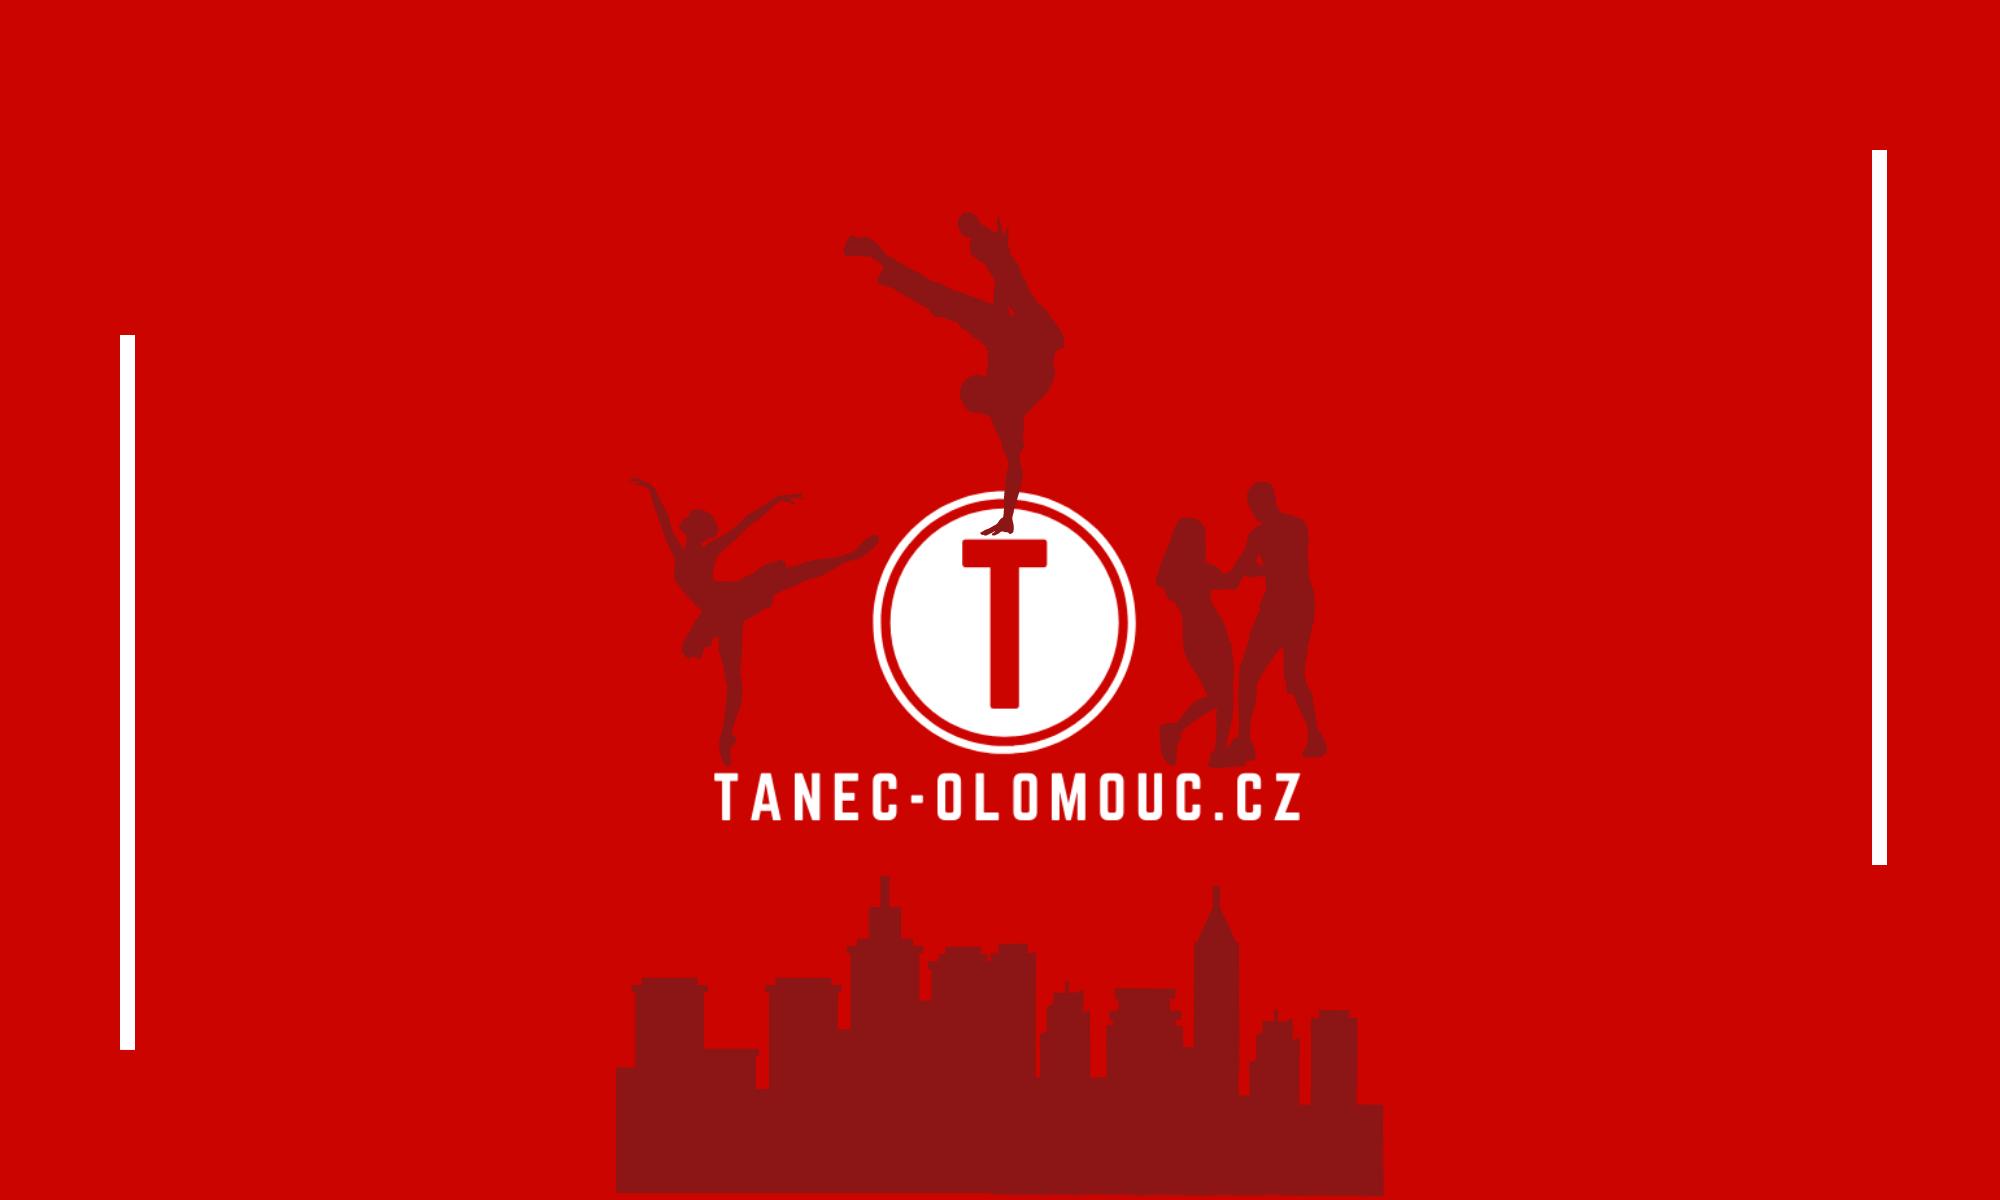 TANEC-OLOMOUC.CZ